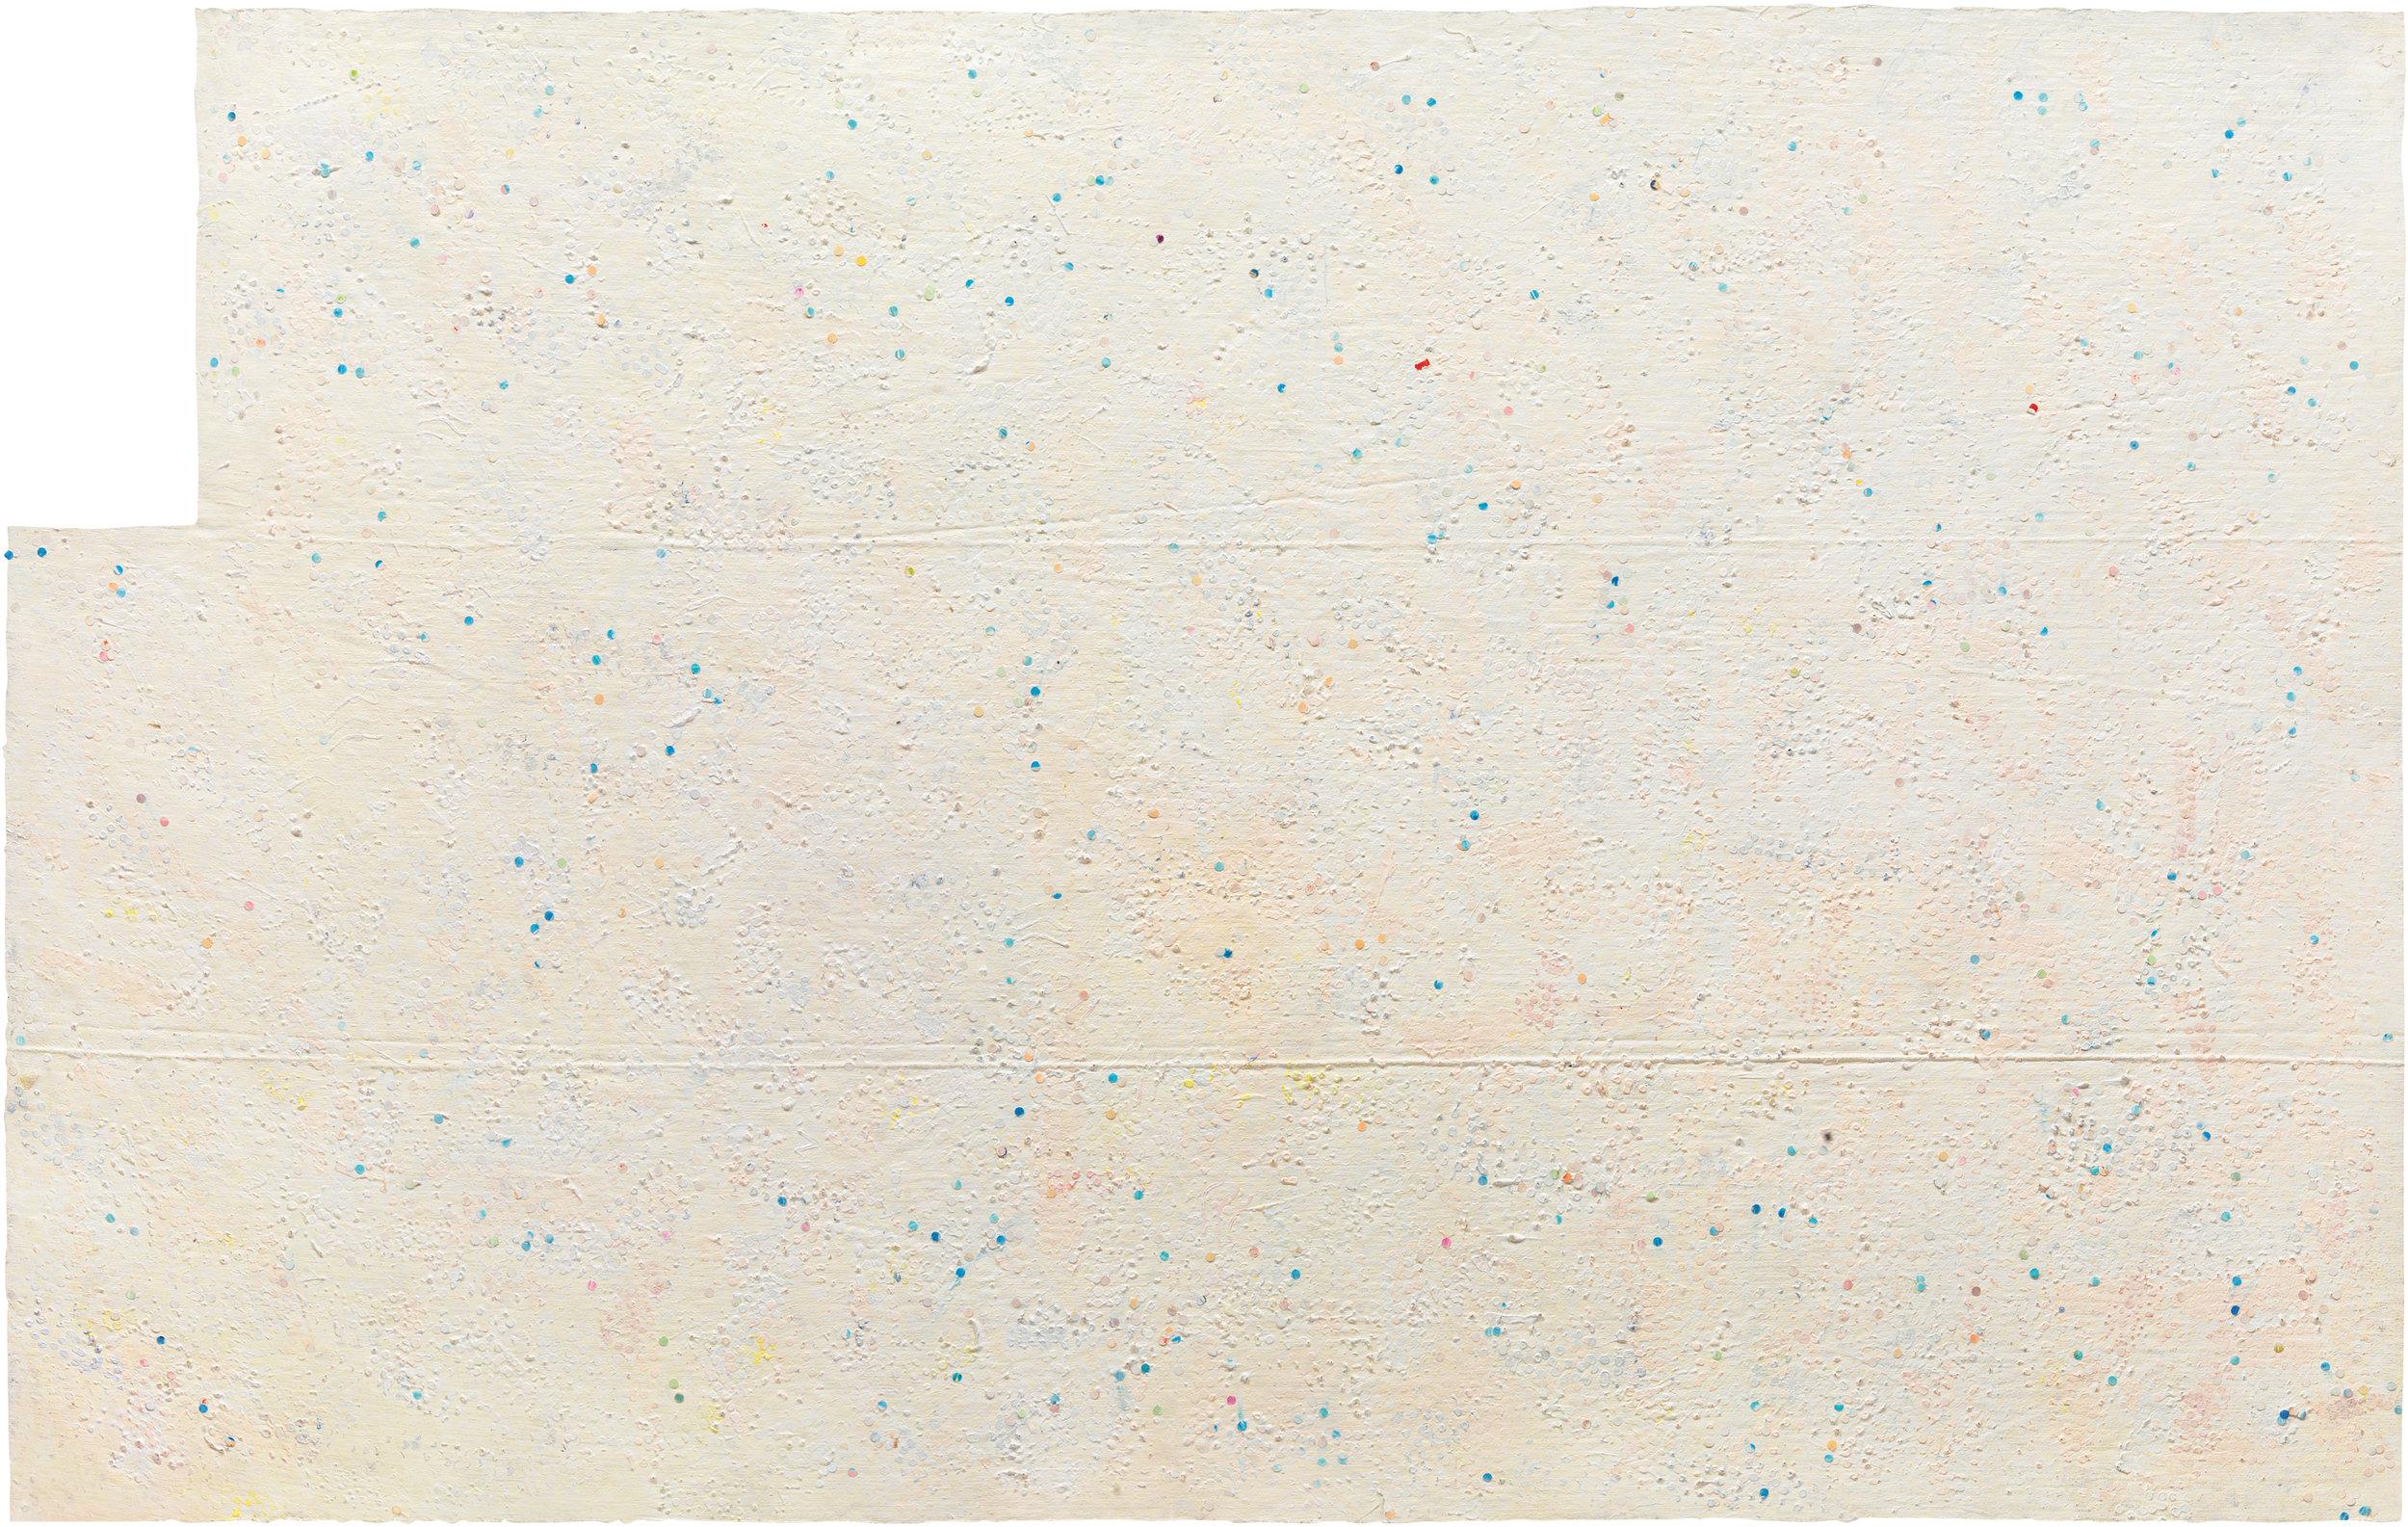 Untitled, 1974–1975